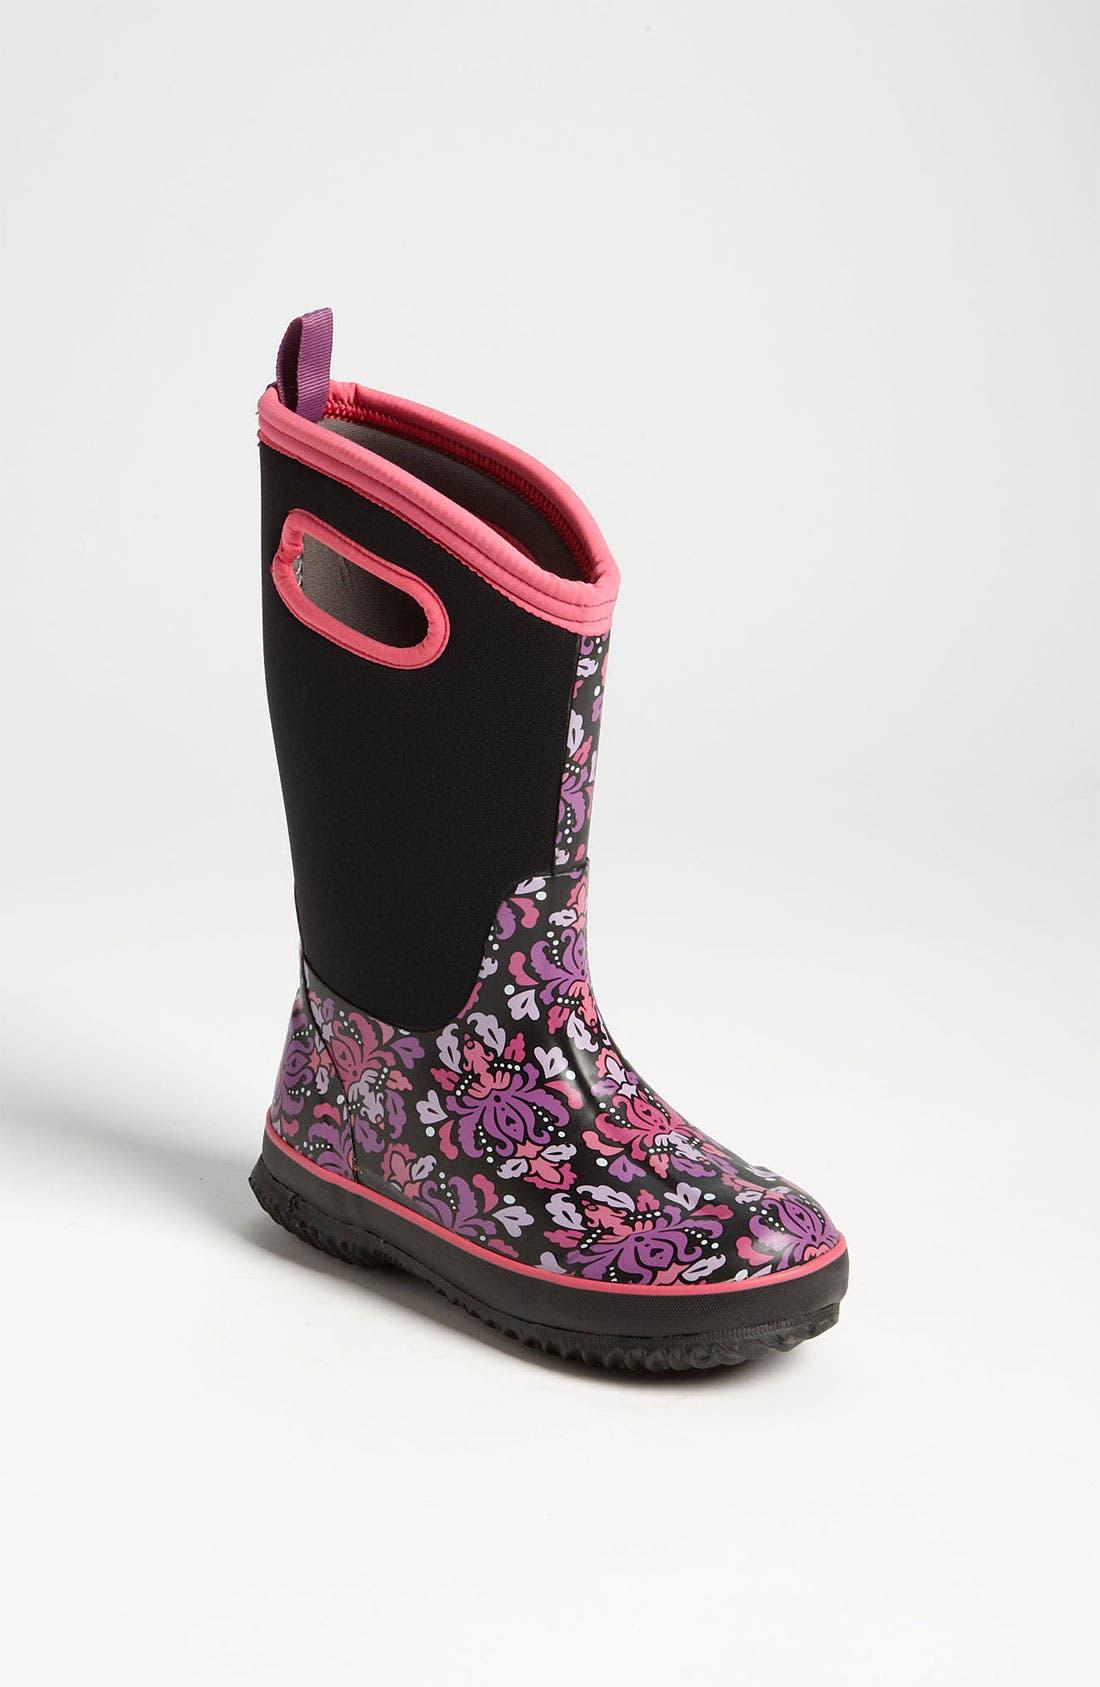 Alternate Image 1 Selected - Bogs 'Classic High - Fleur' Waterproof Boot (Toddler, Little Kid & Big Kid) (Nordstrom Exclusive)